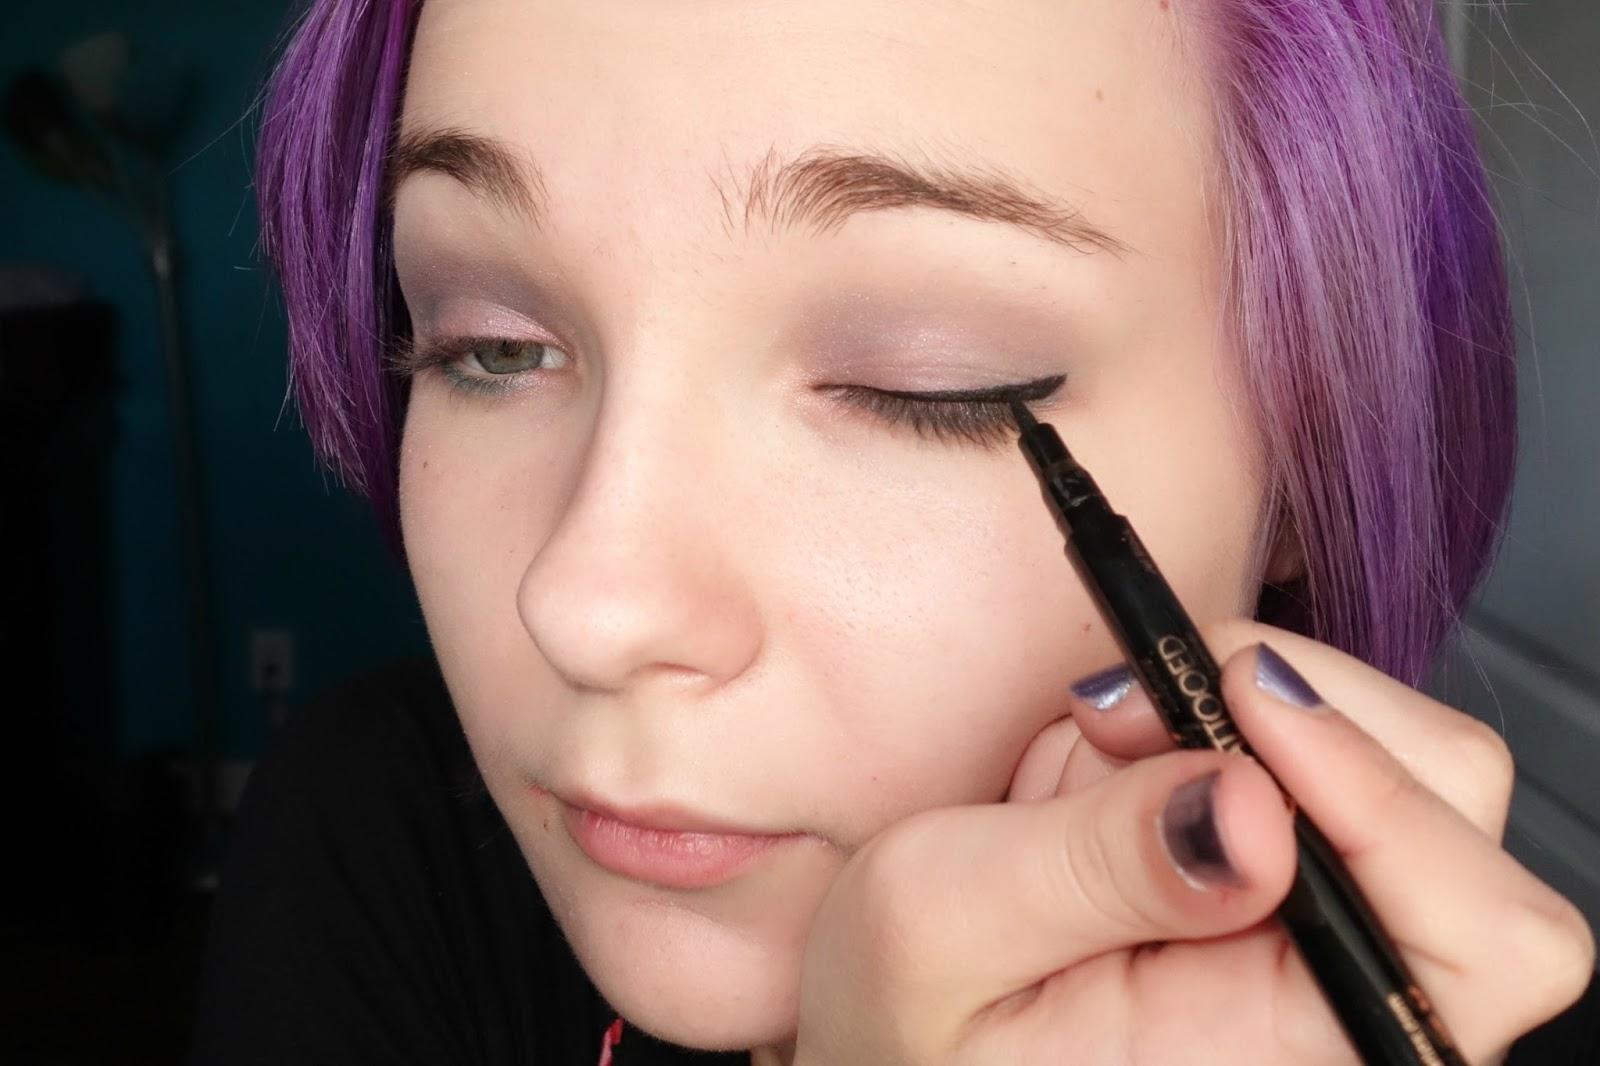 Chromobeauty glossier pink and spring eyes for Skone tattooed eyeliner